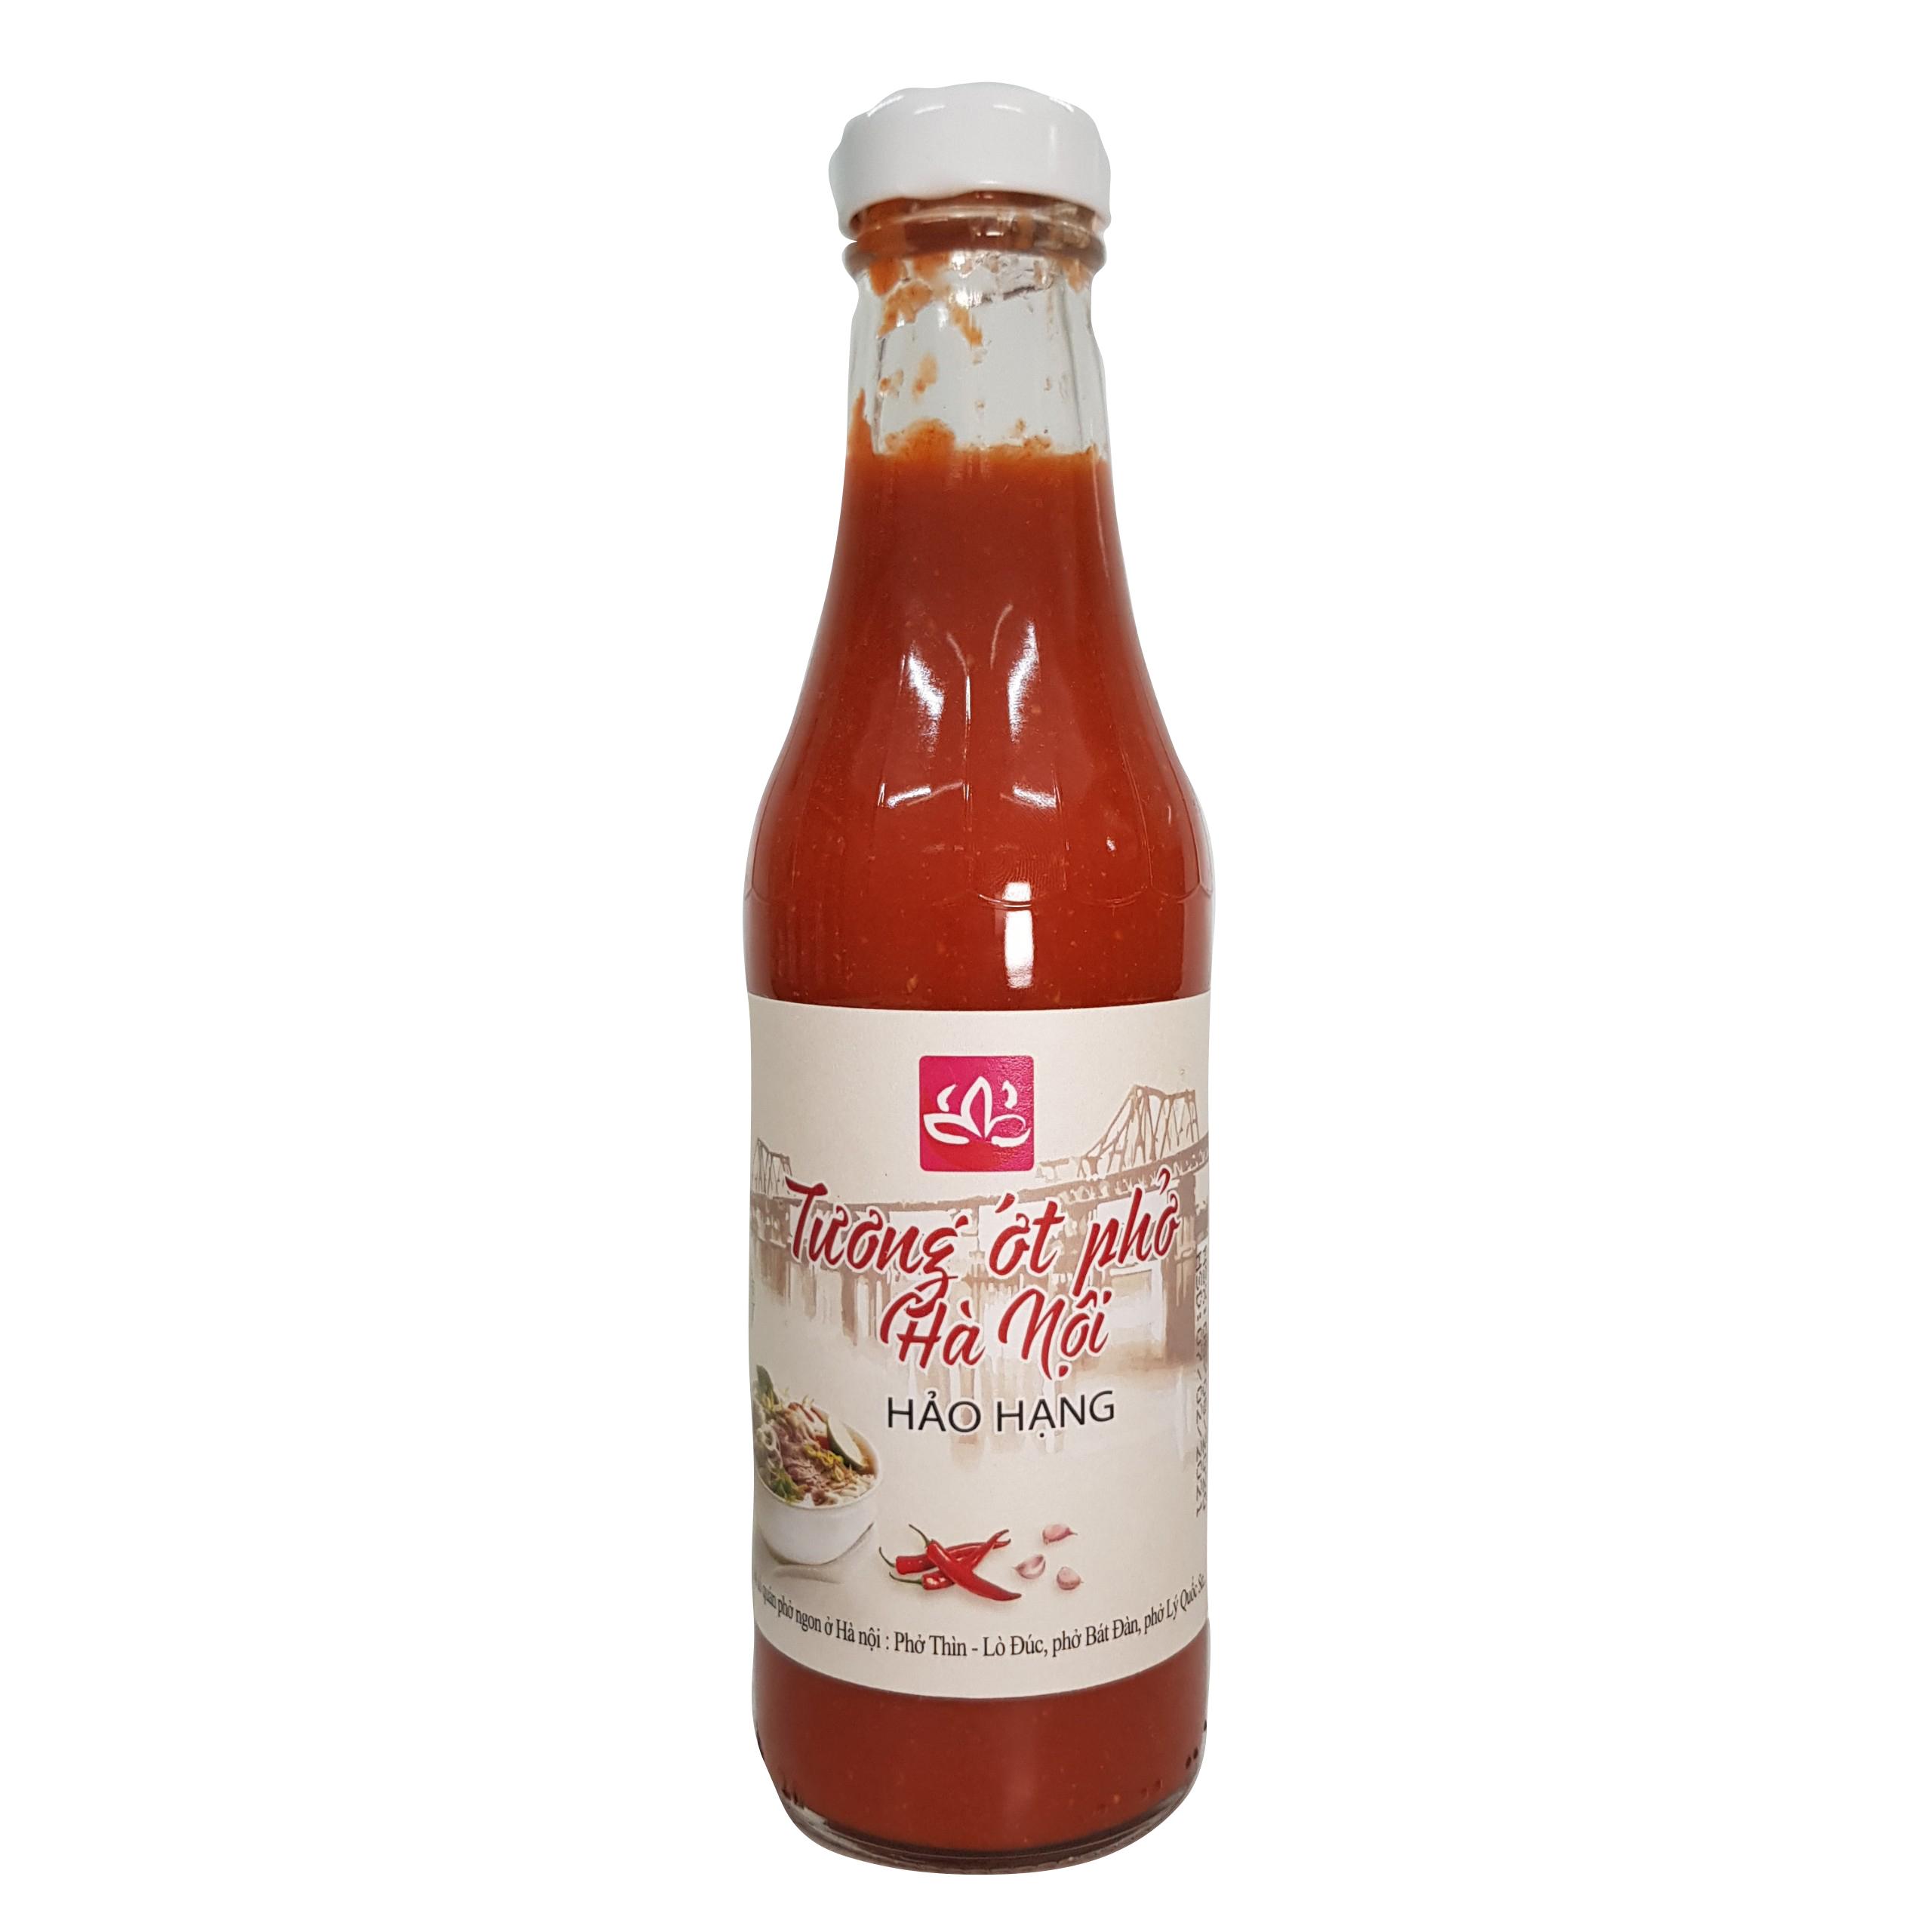 Chili sauce for noodle soup